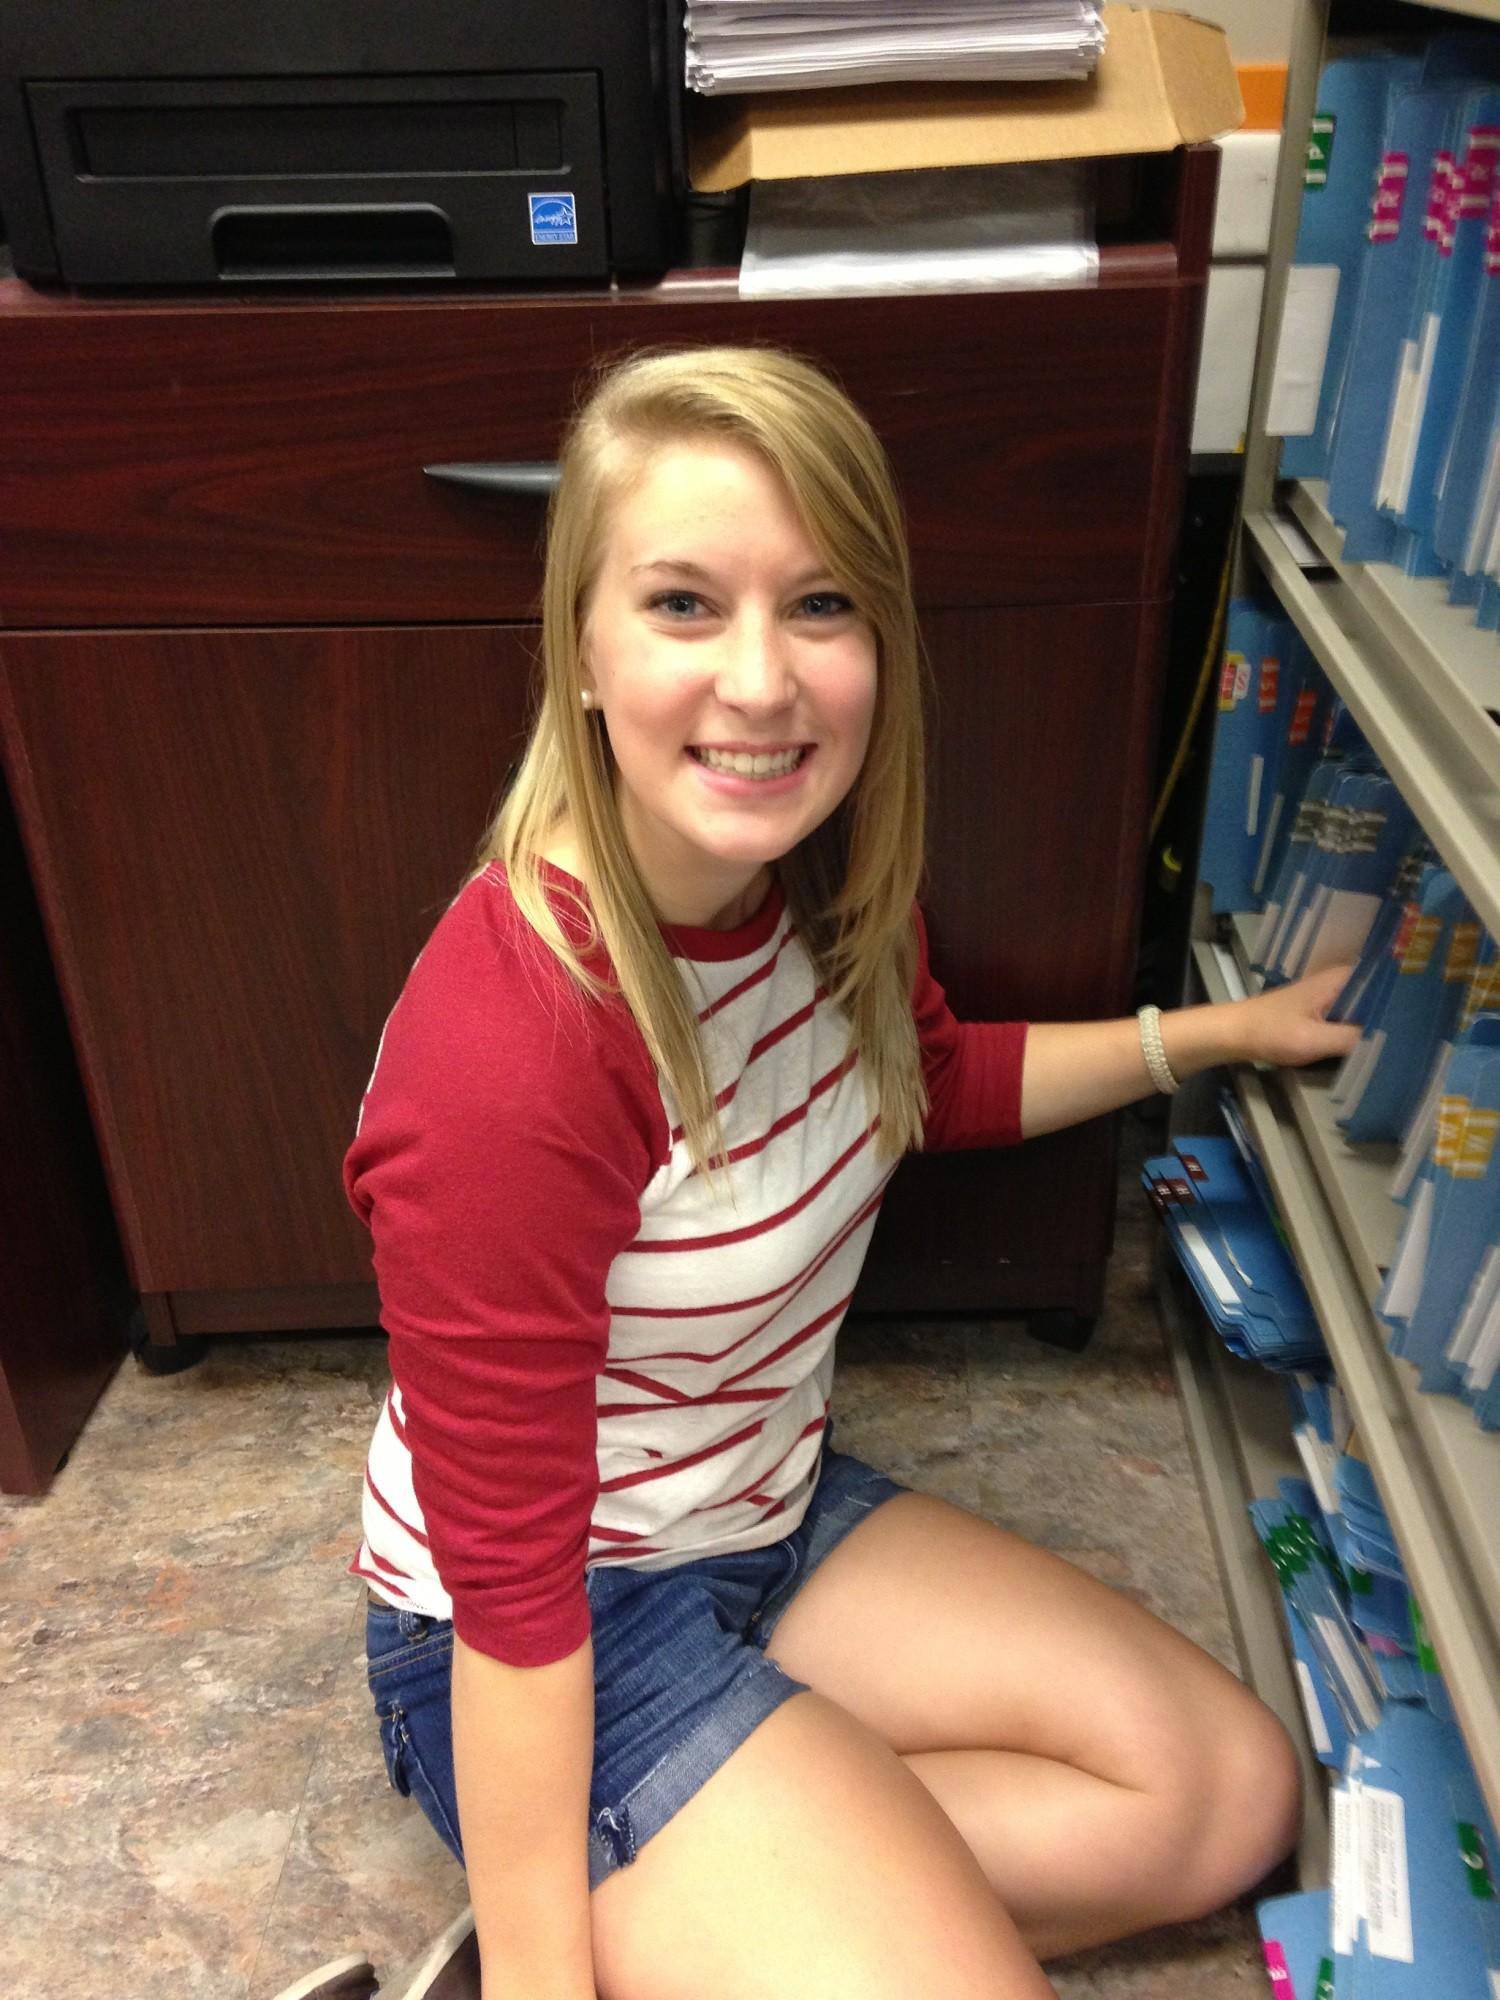 """I like it, but it's a lot to take in. But it's a lot of fun,"" says freshman Haley Hofferbert. (MTSU SIDELINES / John Connor Coulston)"